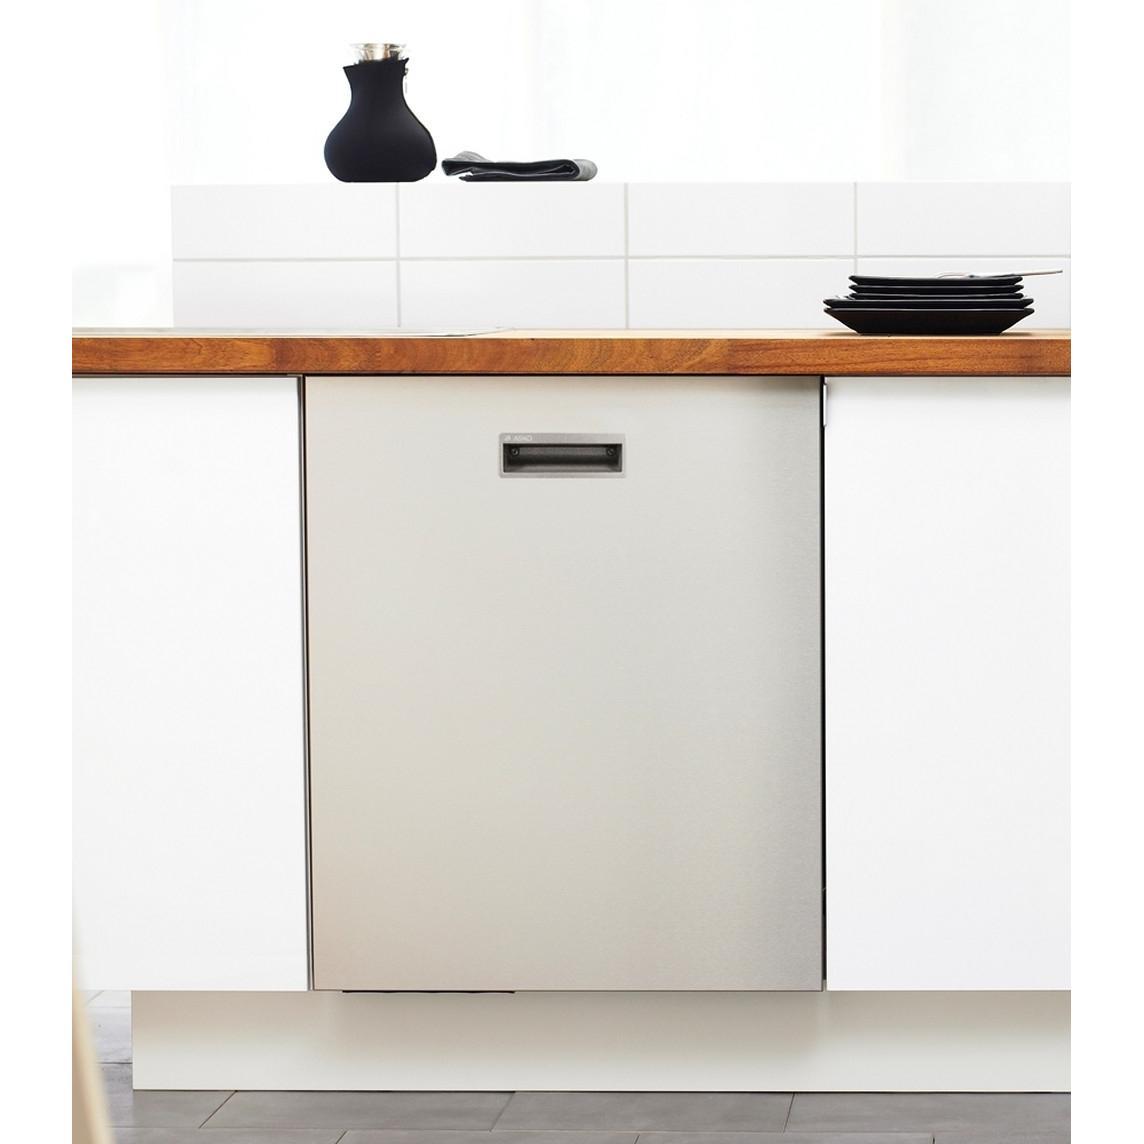 ASKO D5223XXLFI 24-Inch XXL Dishwasher - Custom Panel